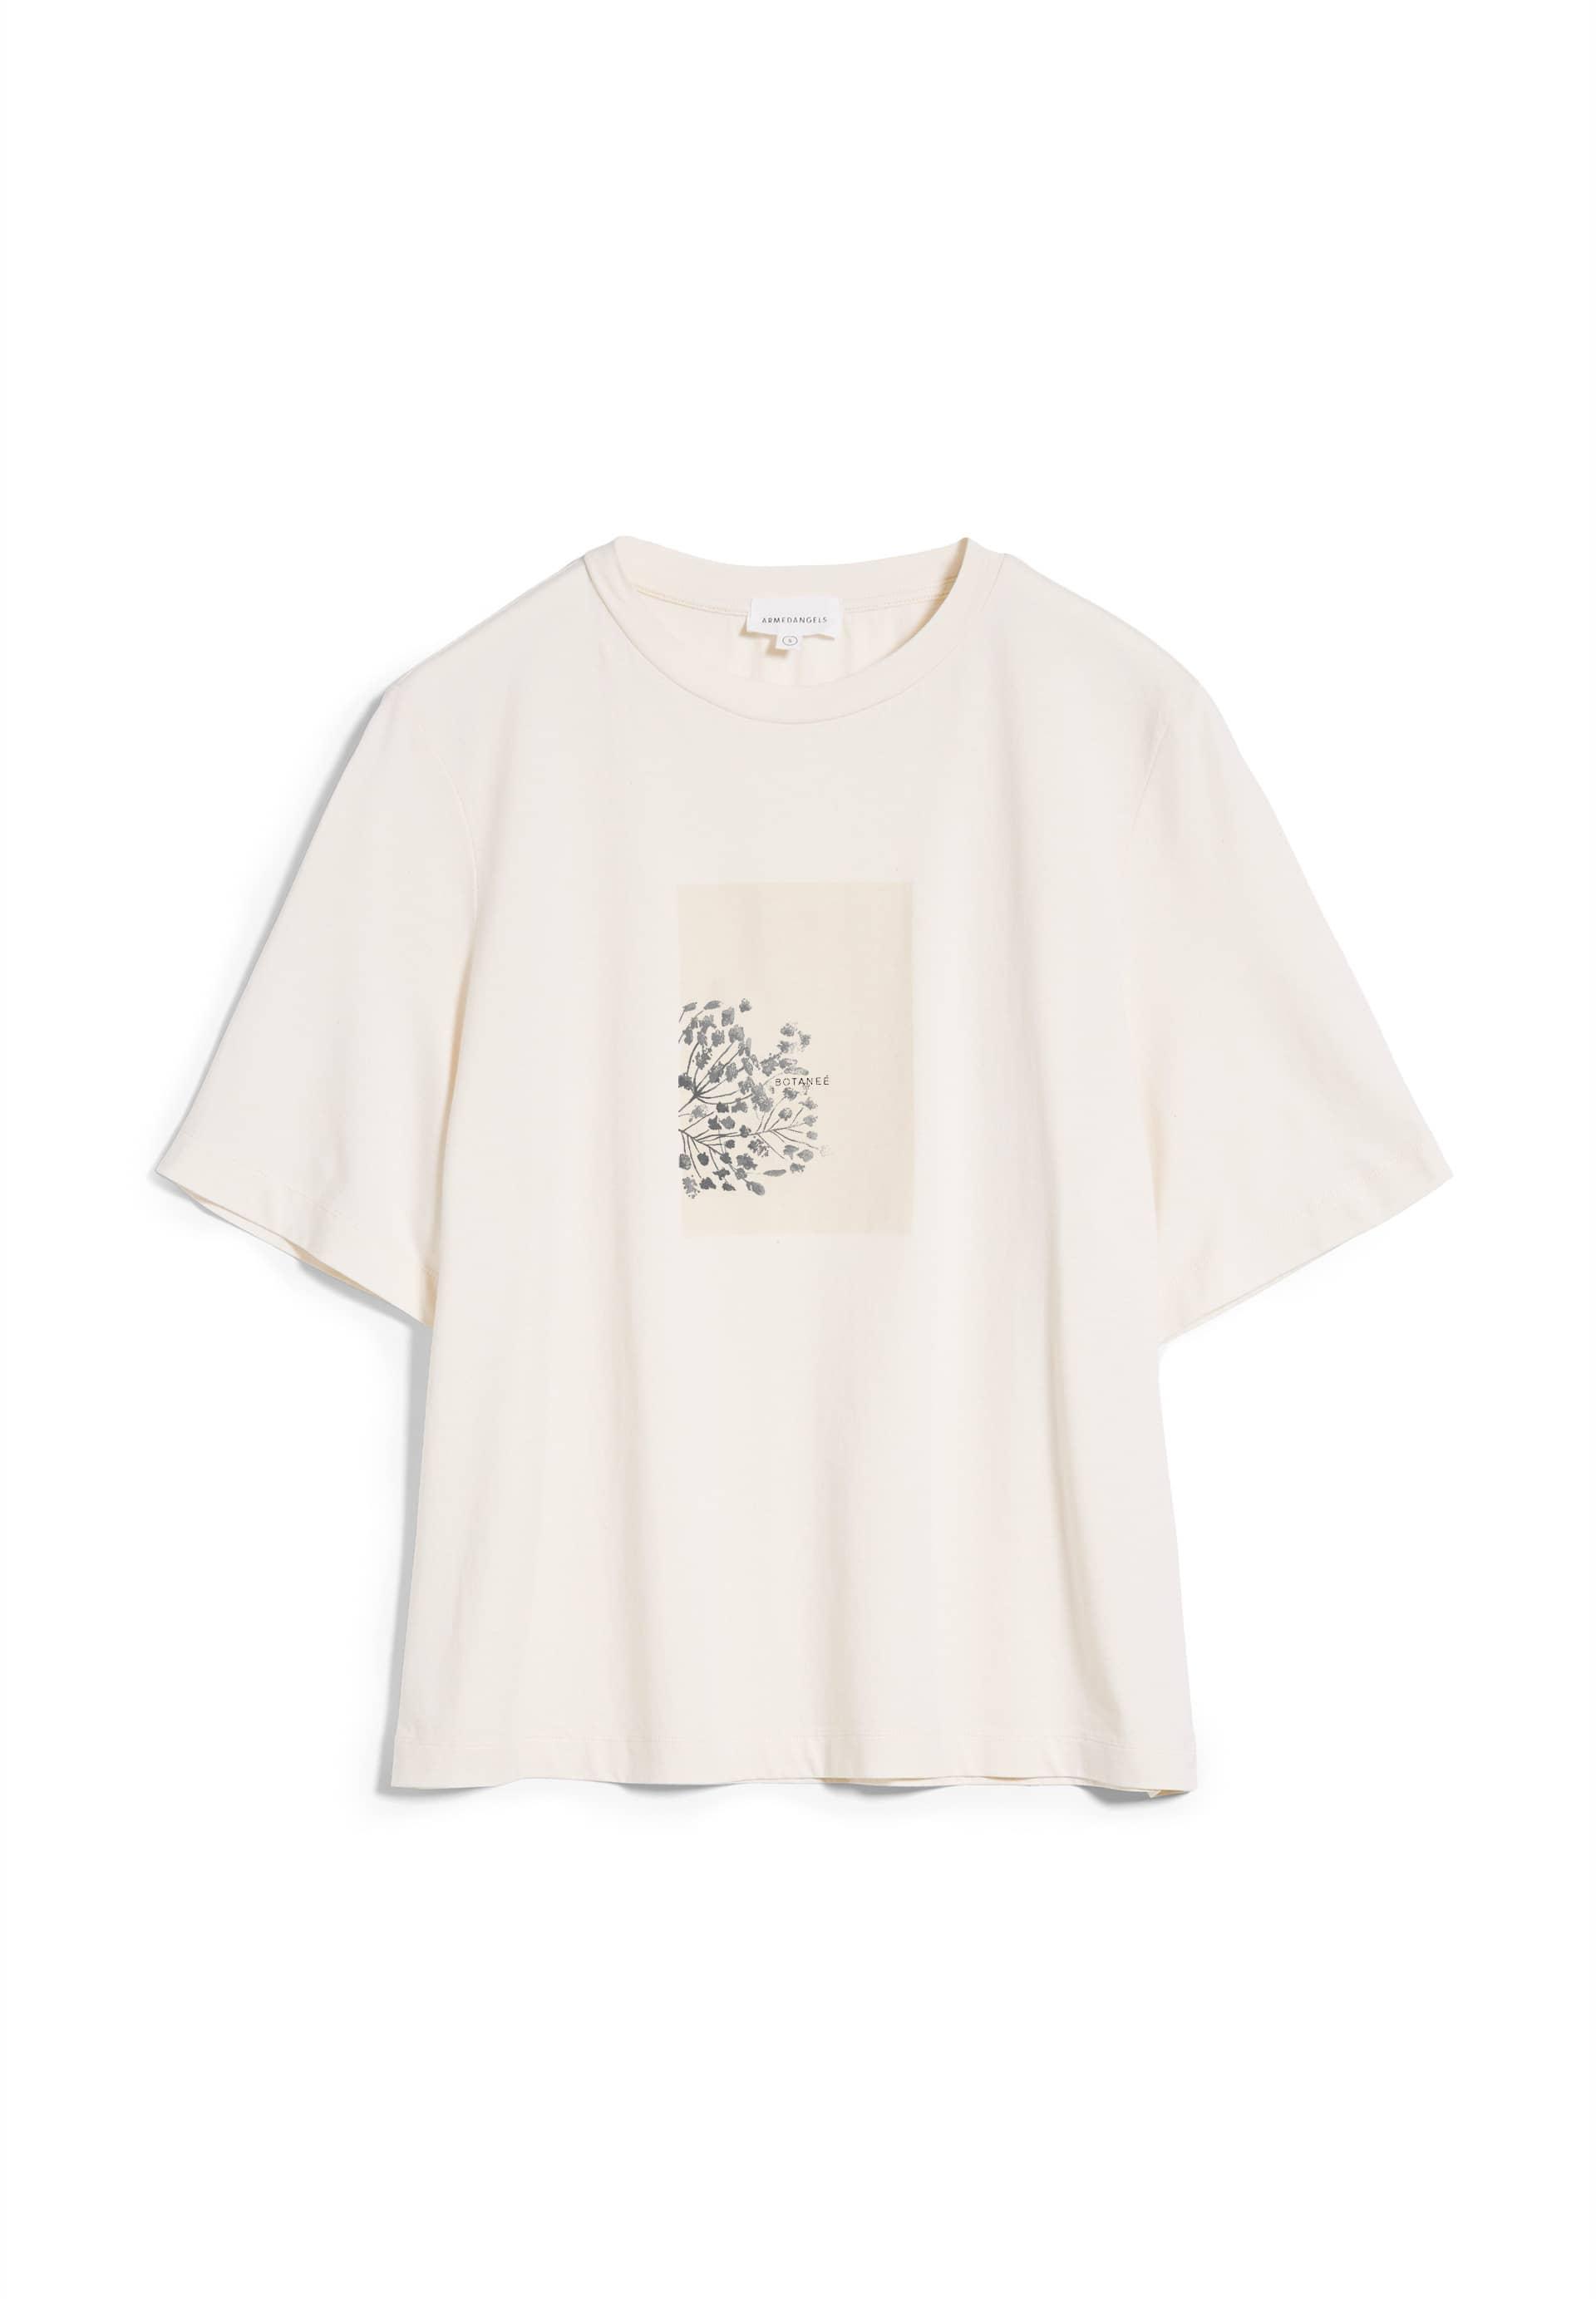 LAYAA BOTANEE T-shirt en coton biologique